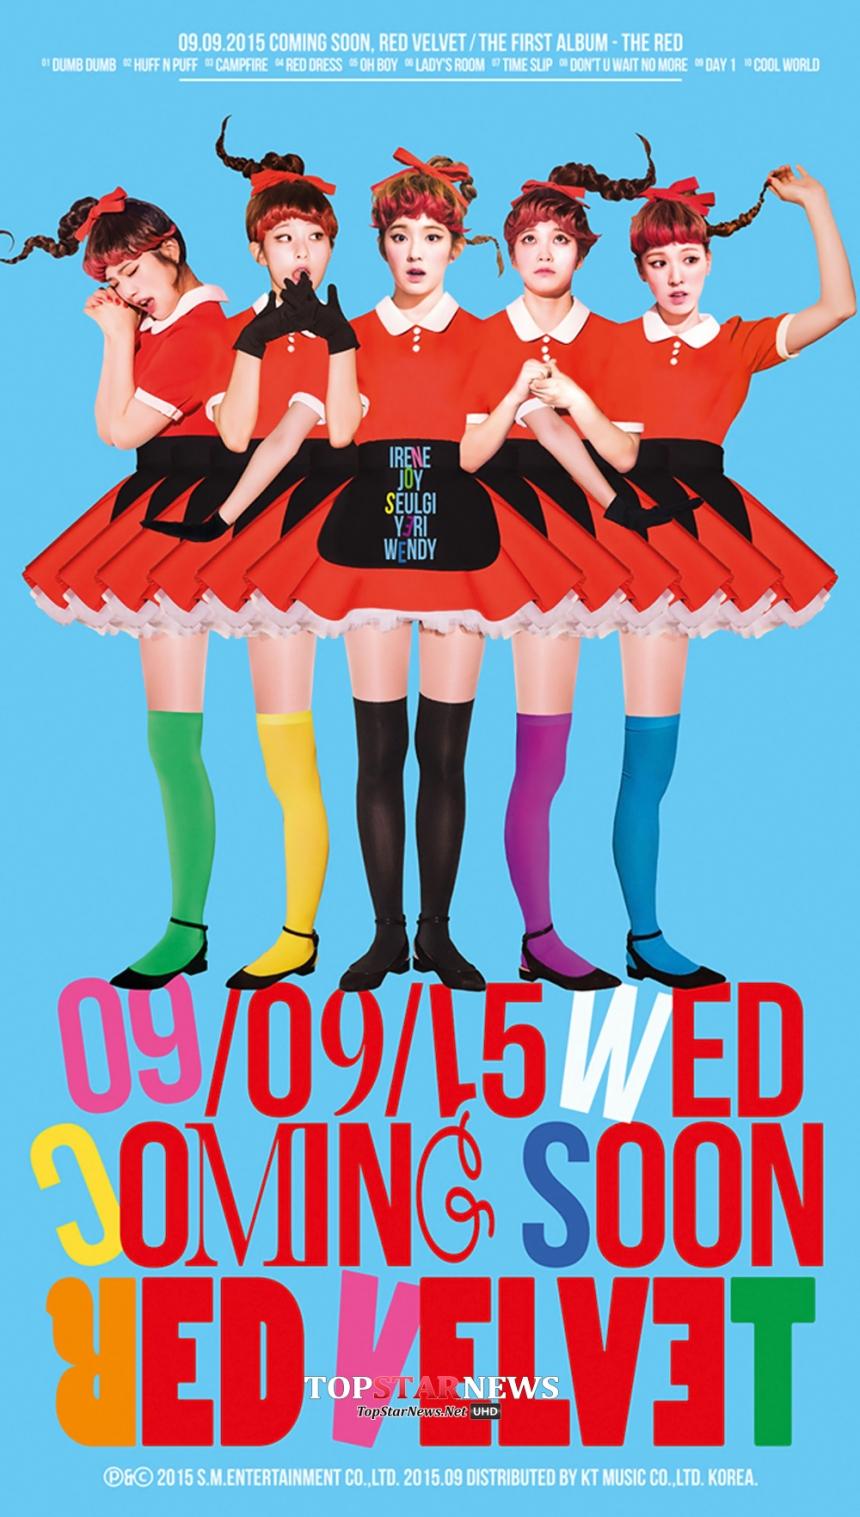 SM娛樂昨天公布的Red Velvet回歸照片中,則是換上了紅髮.....蛤...小編覺得金髮比較美說T_T